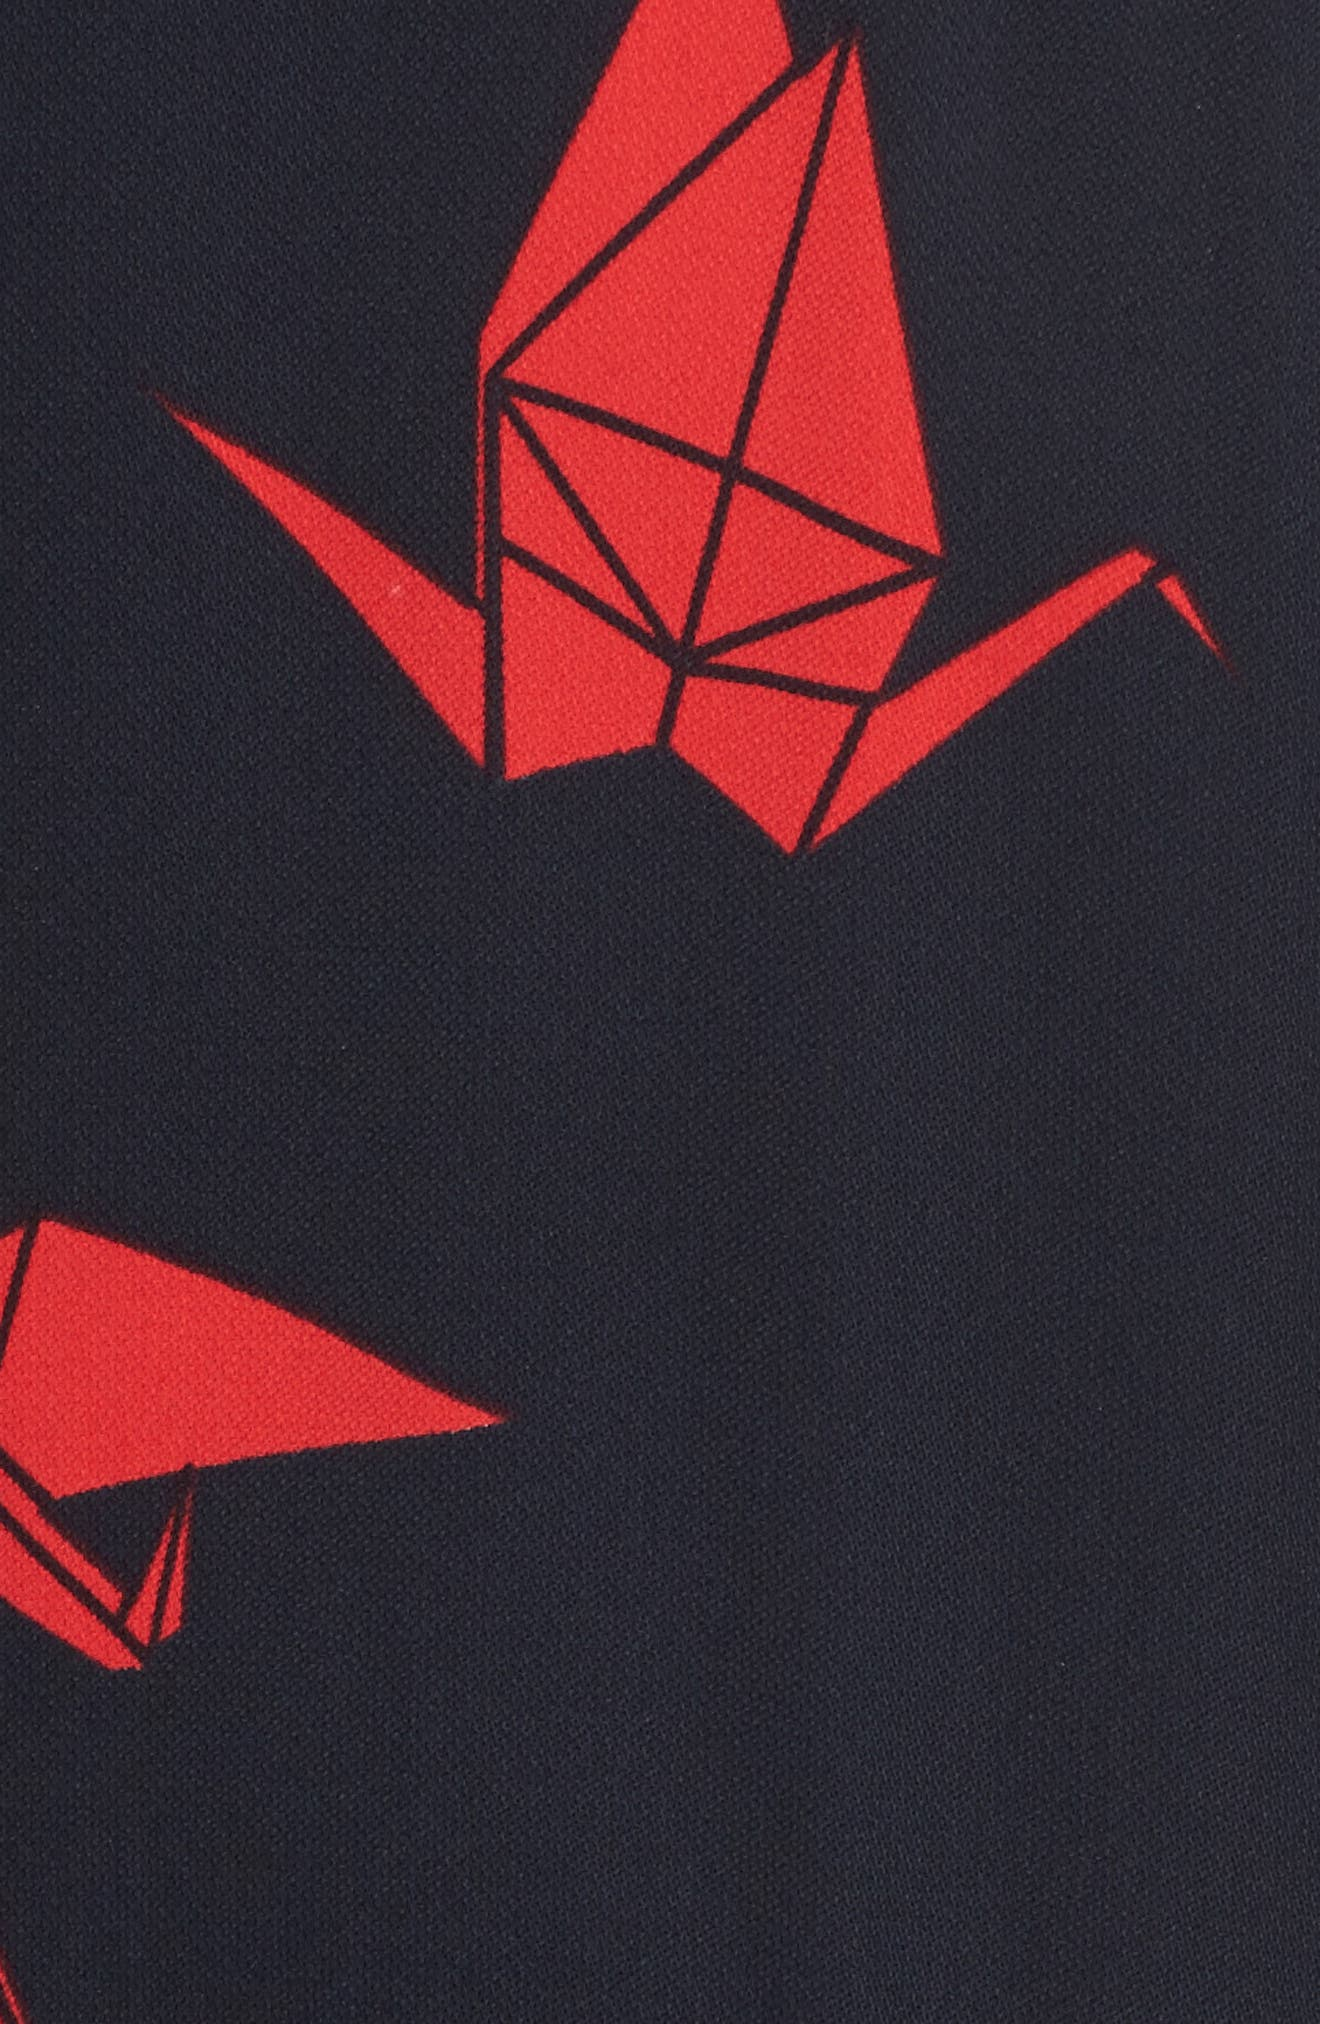 Print Midi Dress,                             Alternate thumbnail 5, color,                             Navy Night Paper Cranes